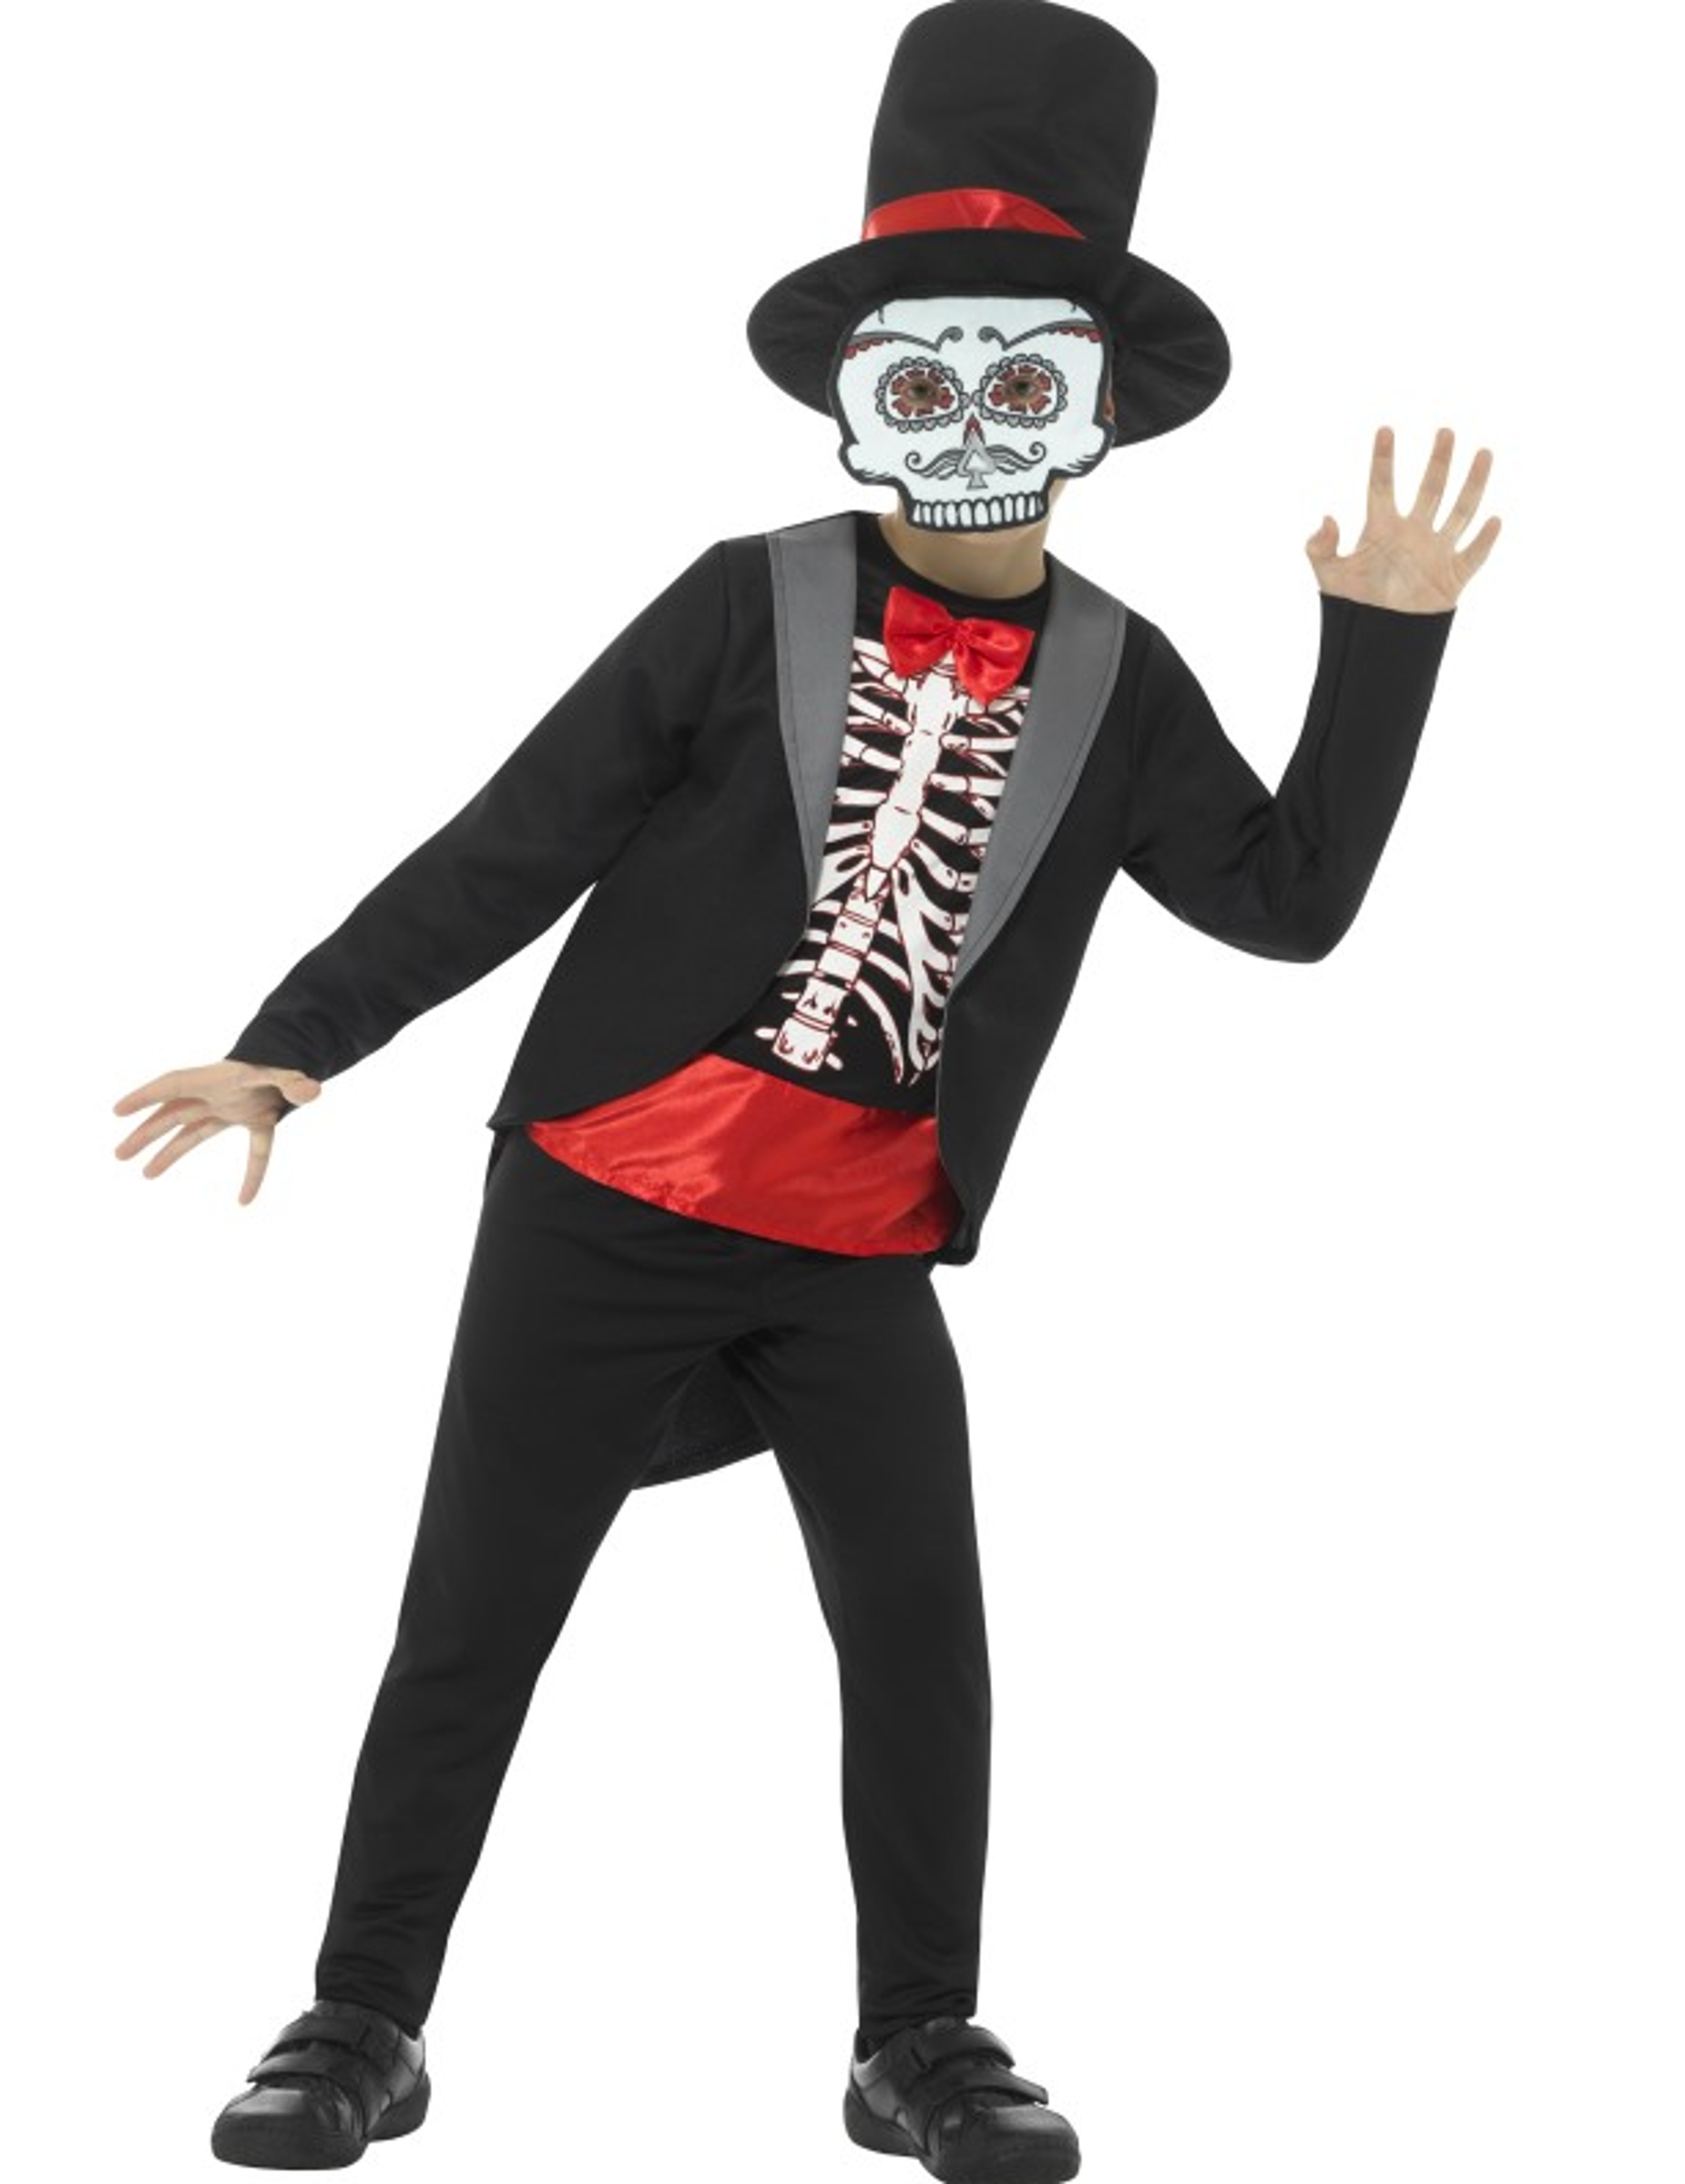 Gentleman skelett -Halloweenkostym för barn 4a11d151e4a03